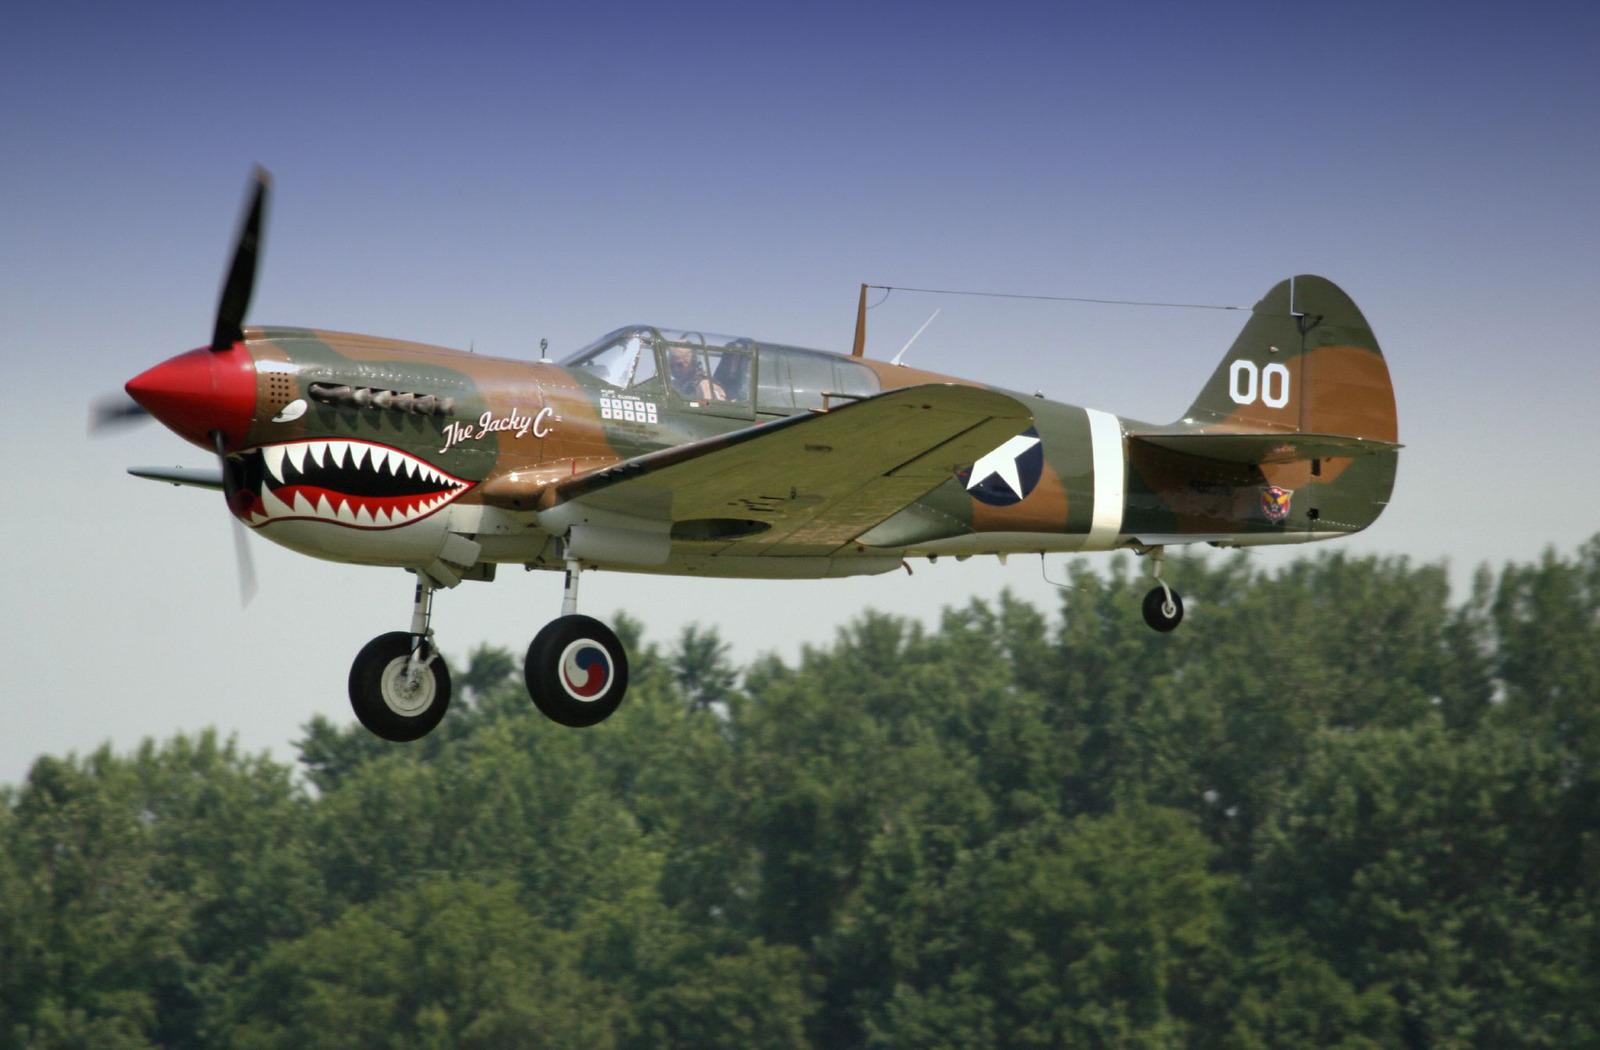 Curtiss_p40_warhawk_airshow